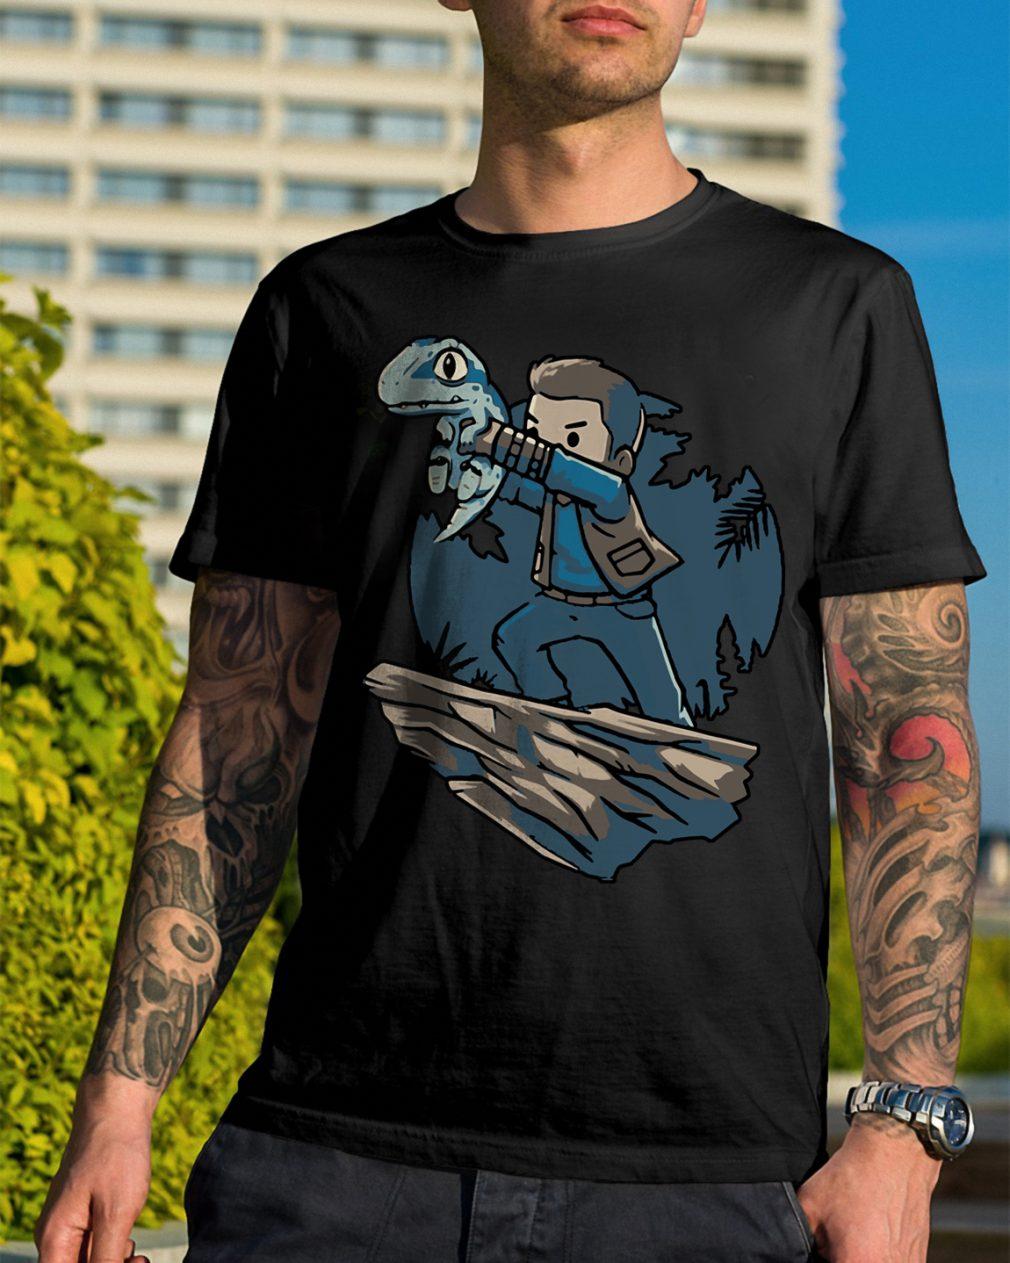 Official Raptor King Shirt